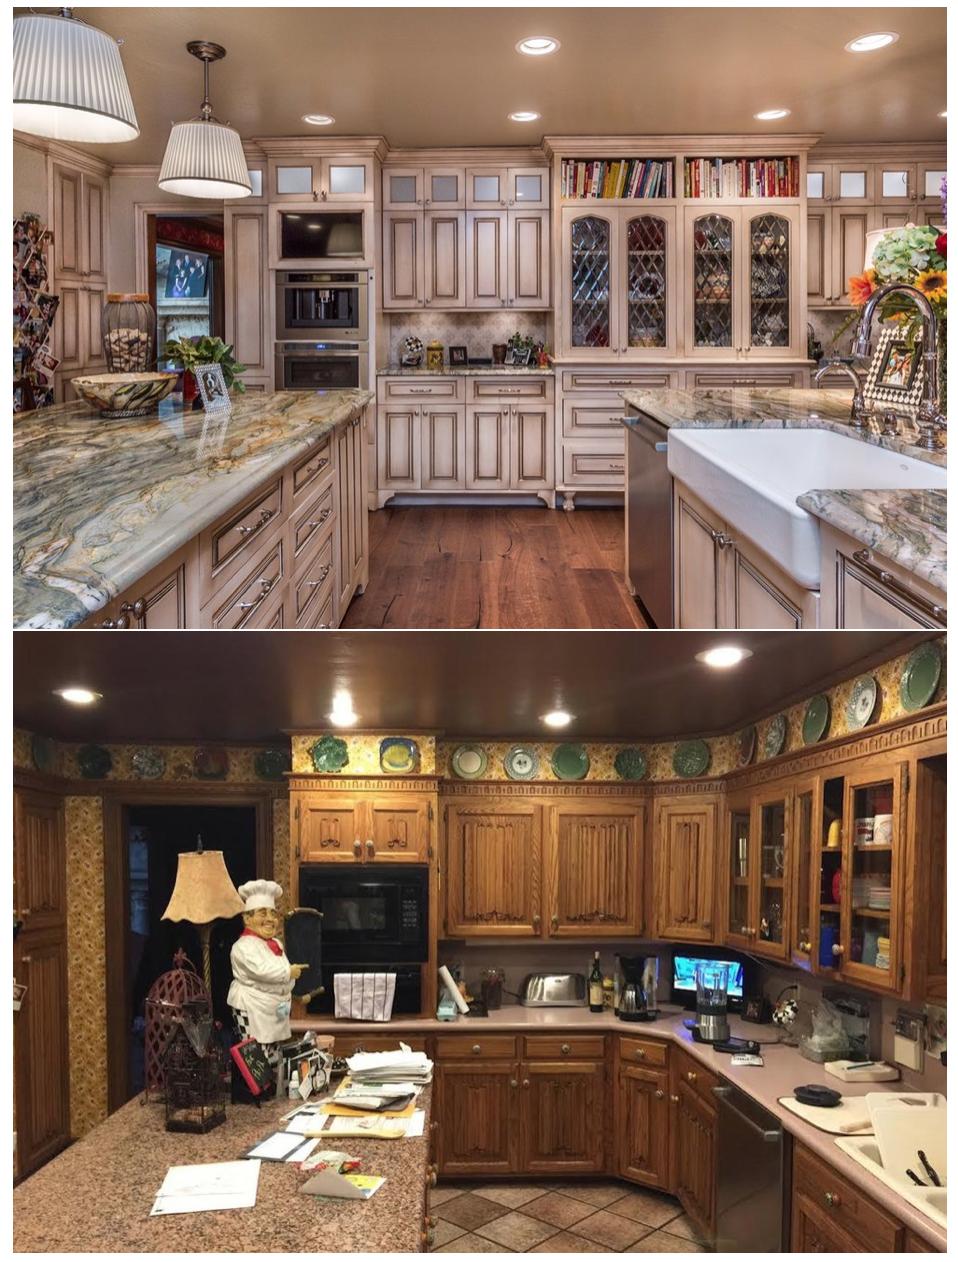 Top - Kitchen After, Bottom - Kitchen Before